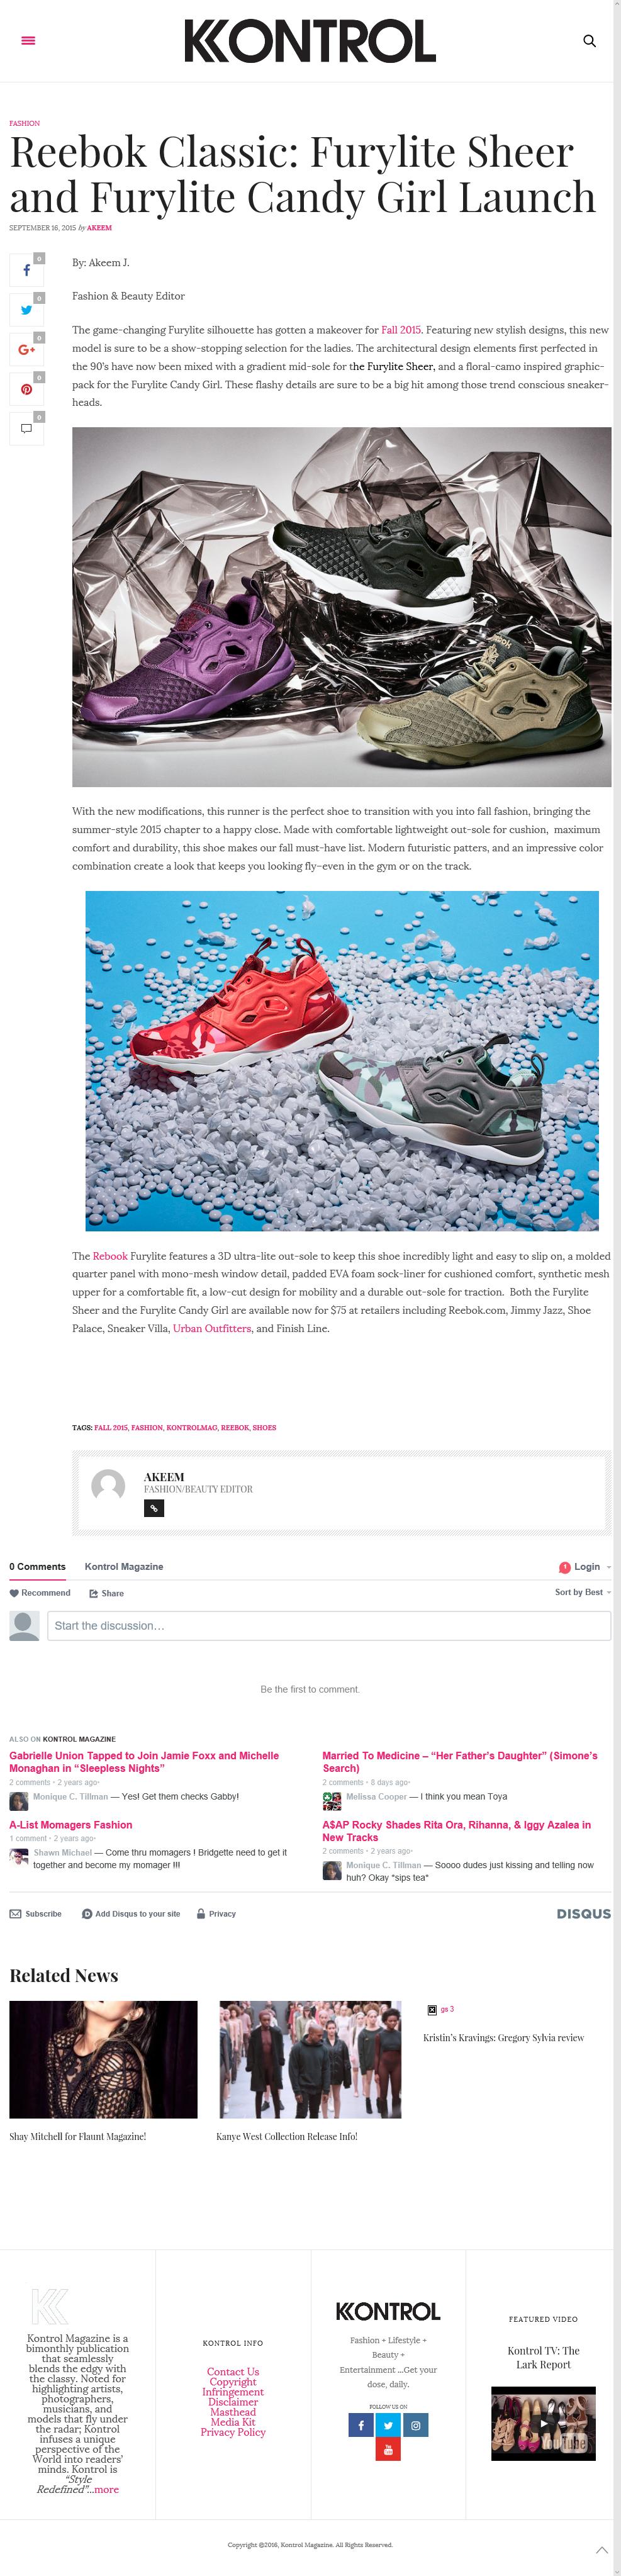 bok Classic Furylite Sheer and Furylite Candy Girl Launch-Kontrol Mag Sep 2015